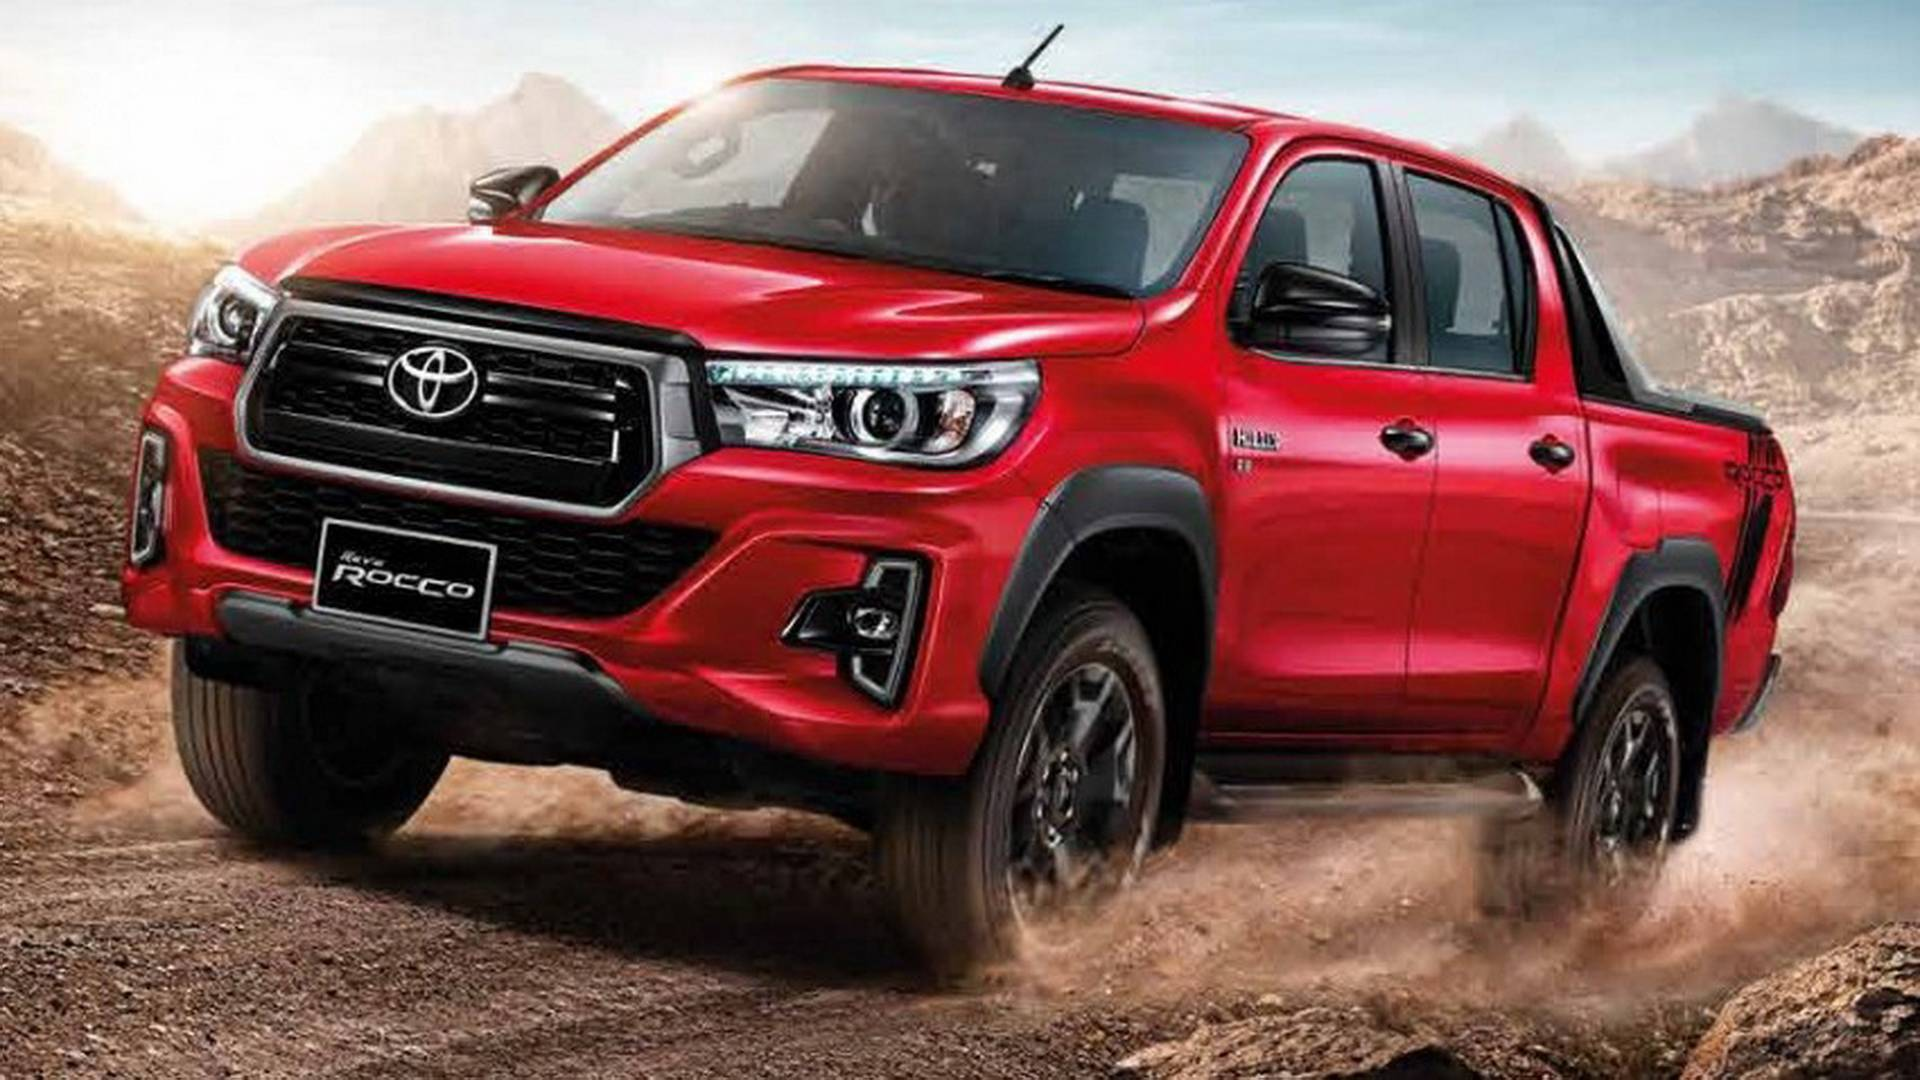 Kekurangan Toyota Hilux 2018 Harga